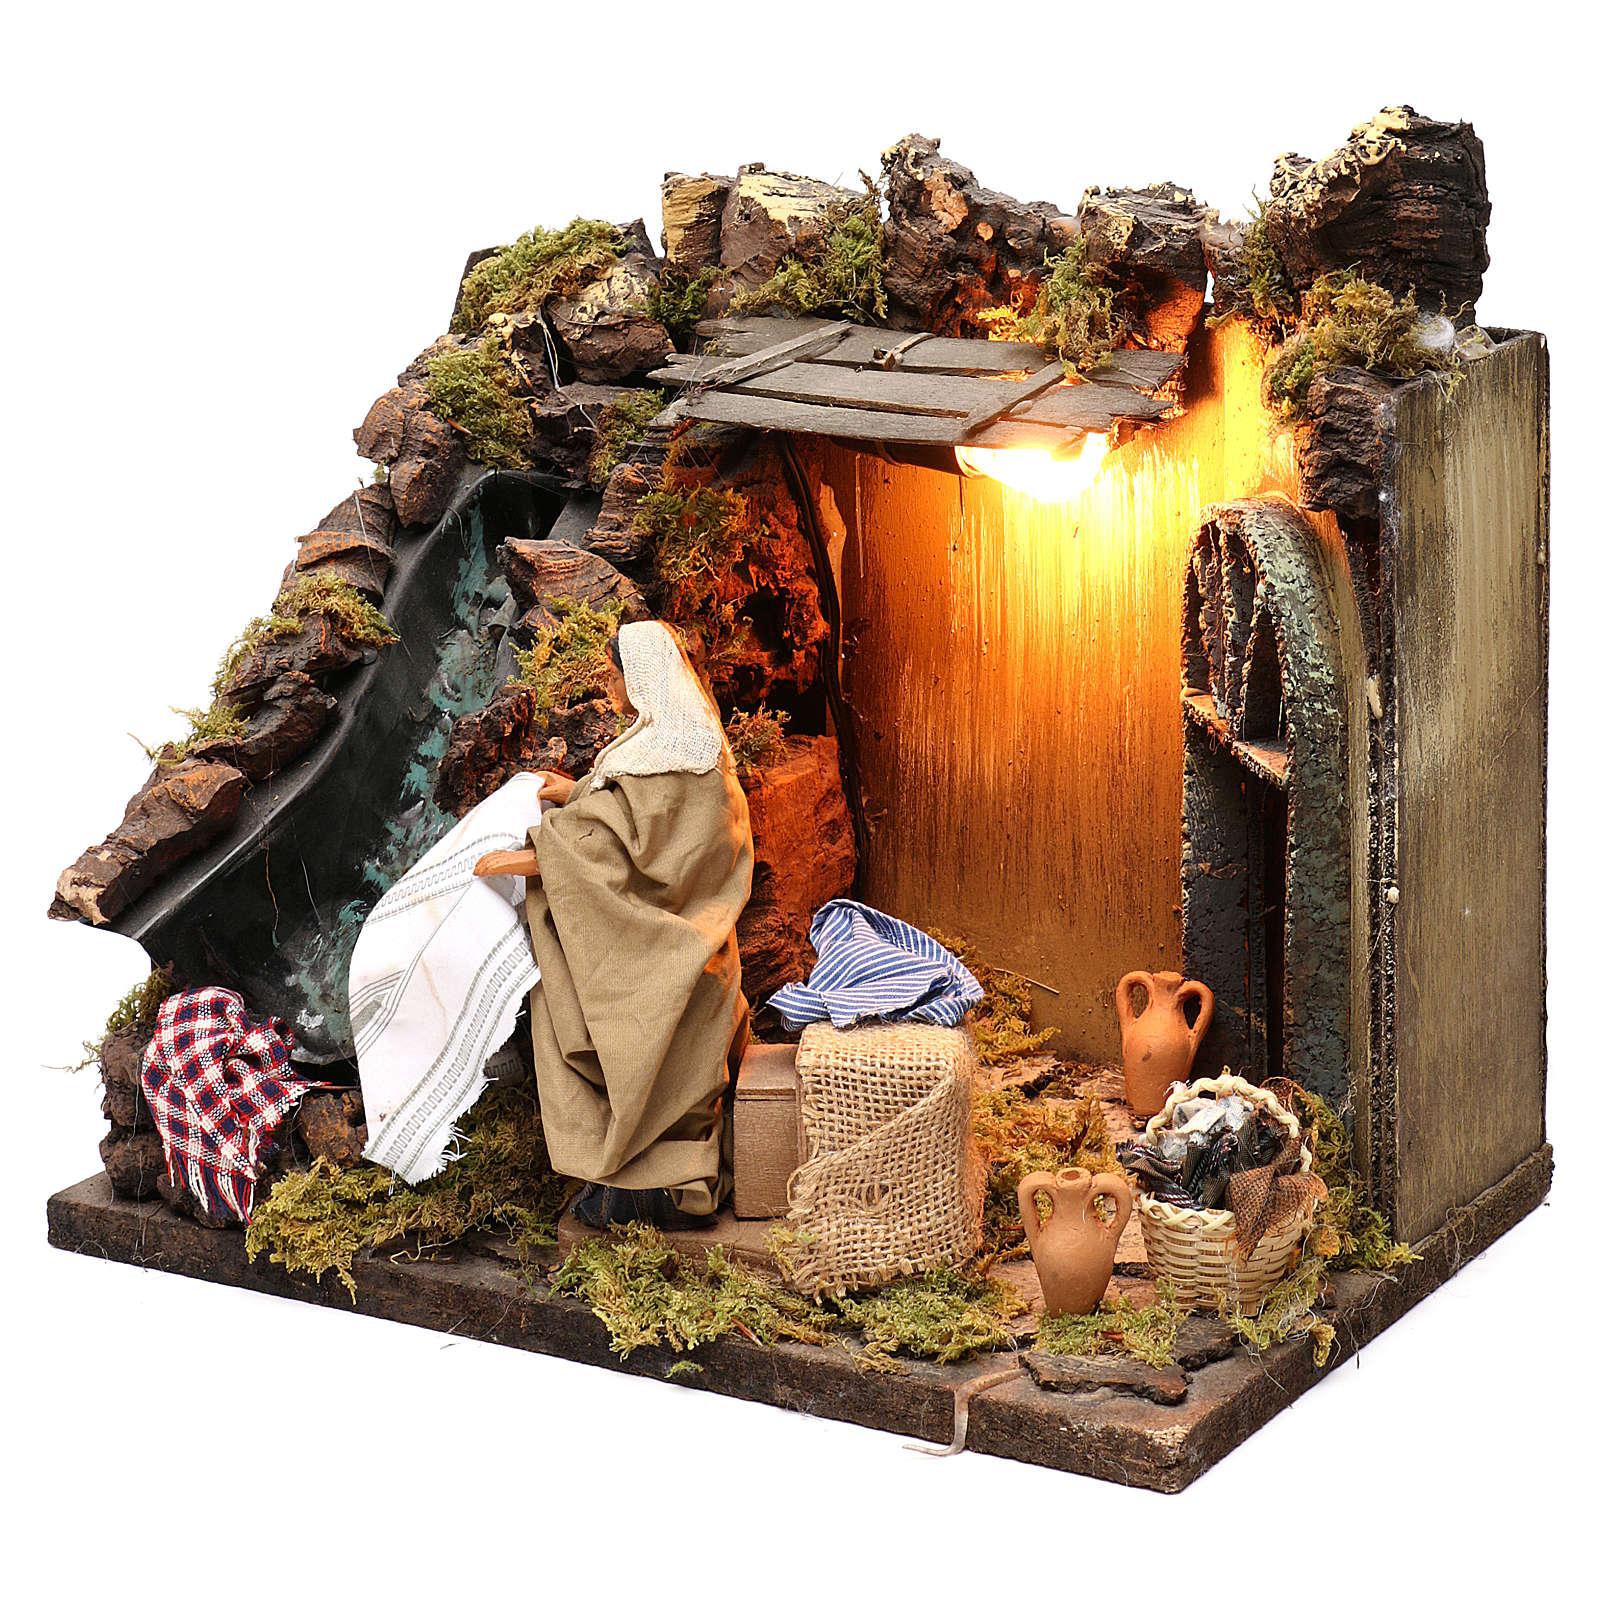 Animated Nativity scene figurine, laundress, 12 cm 4